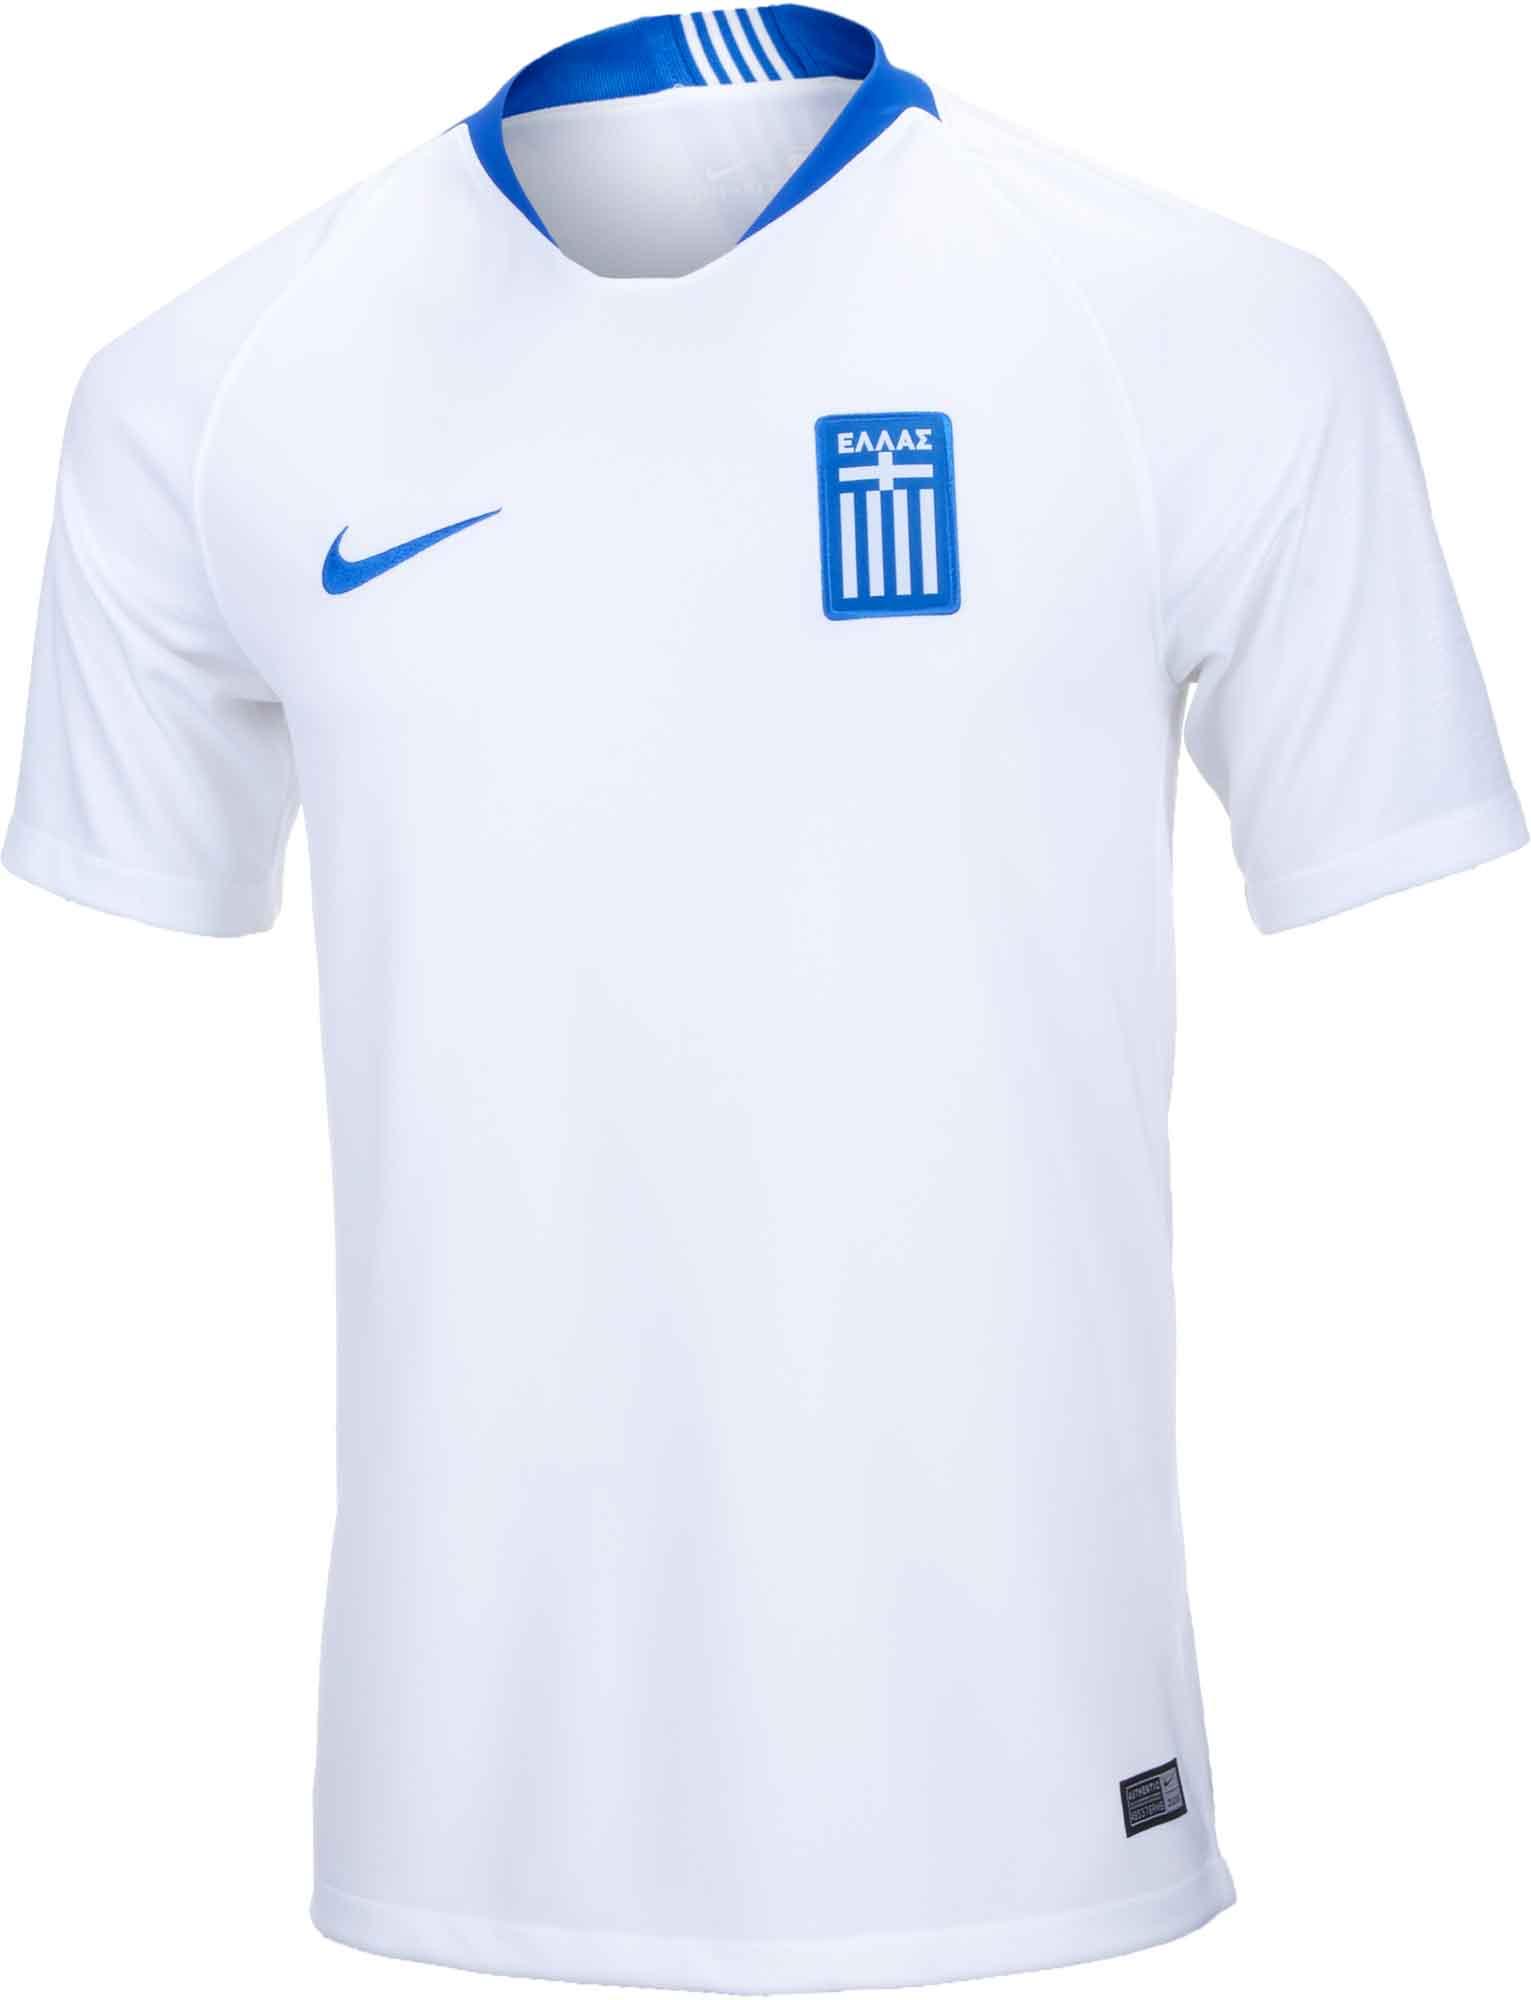 4d2d622b6 Nike Greece Home Jersey 2018-19 - SoccerPro